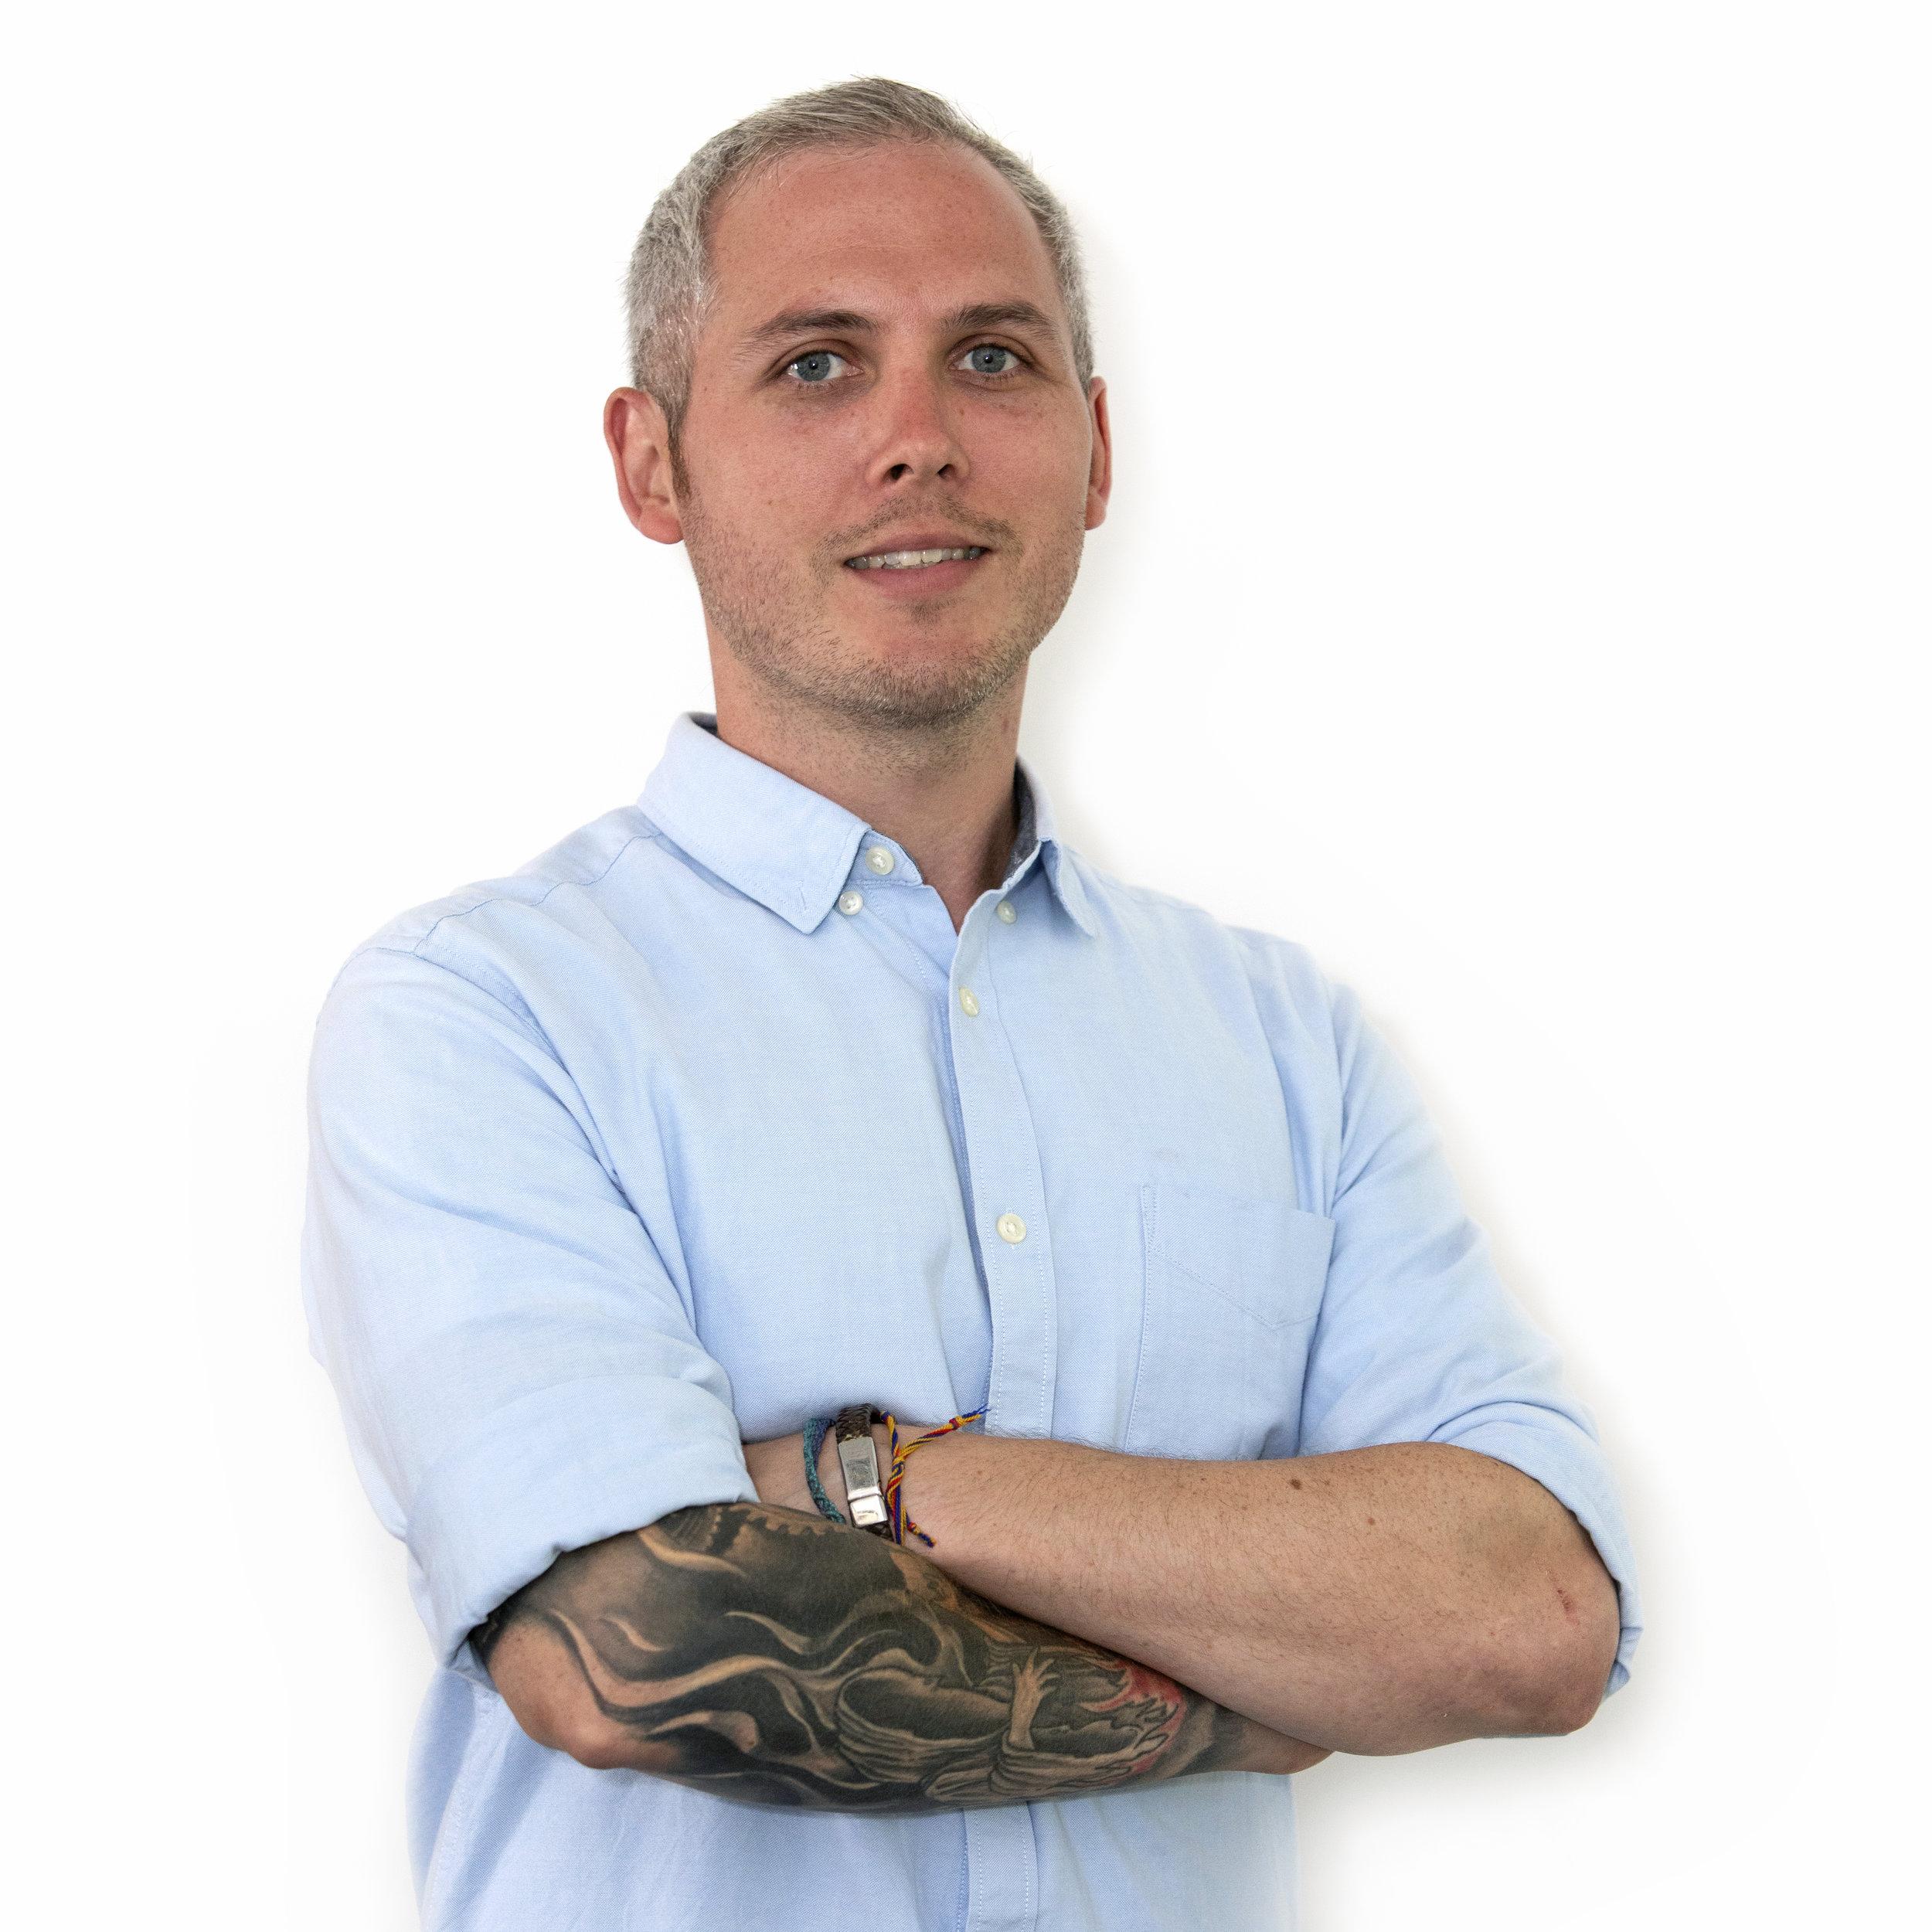 Gareth Coles